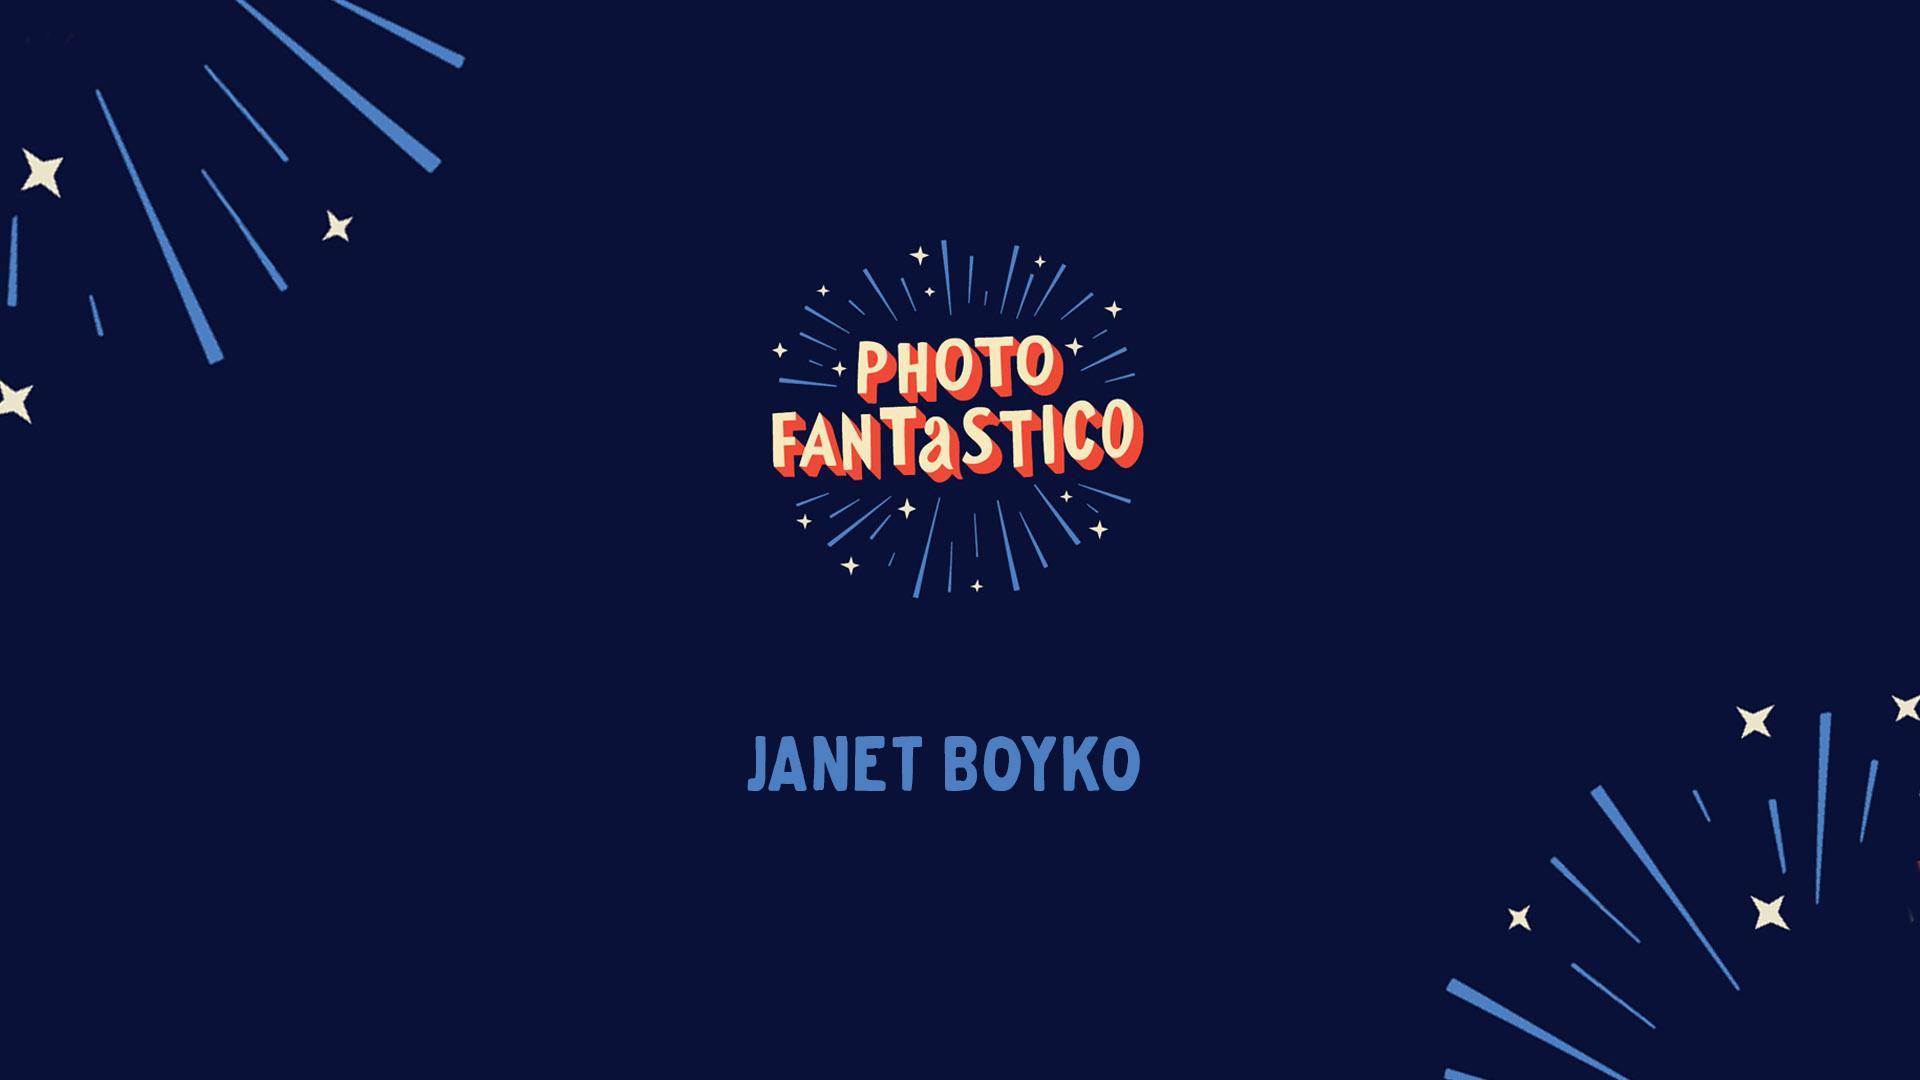 Janet Boyko